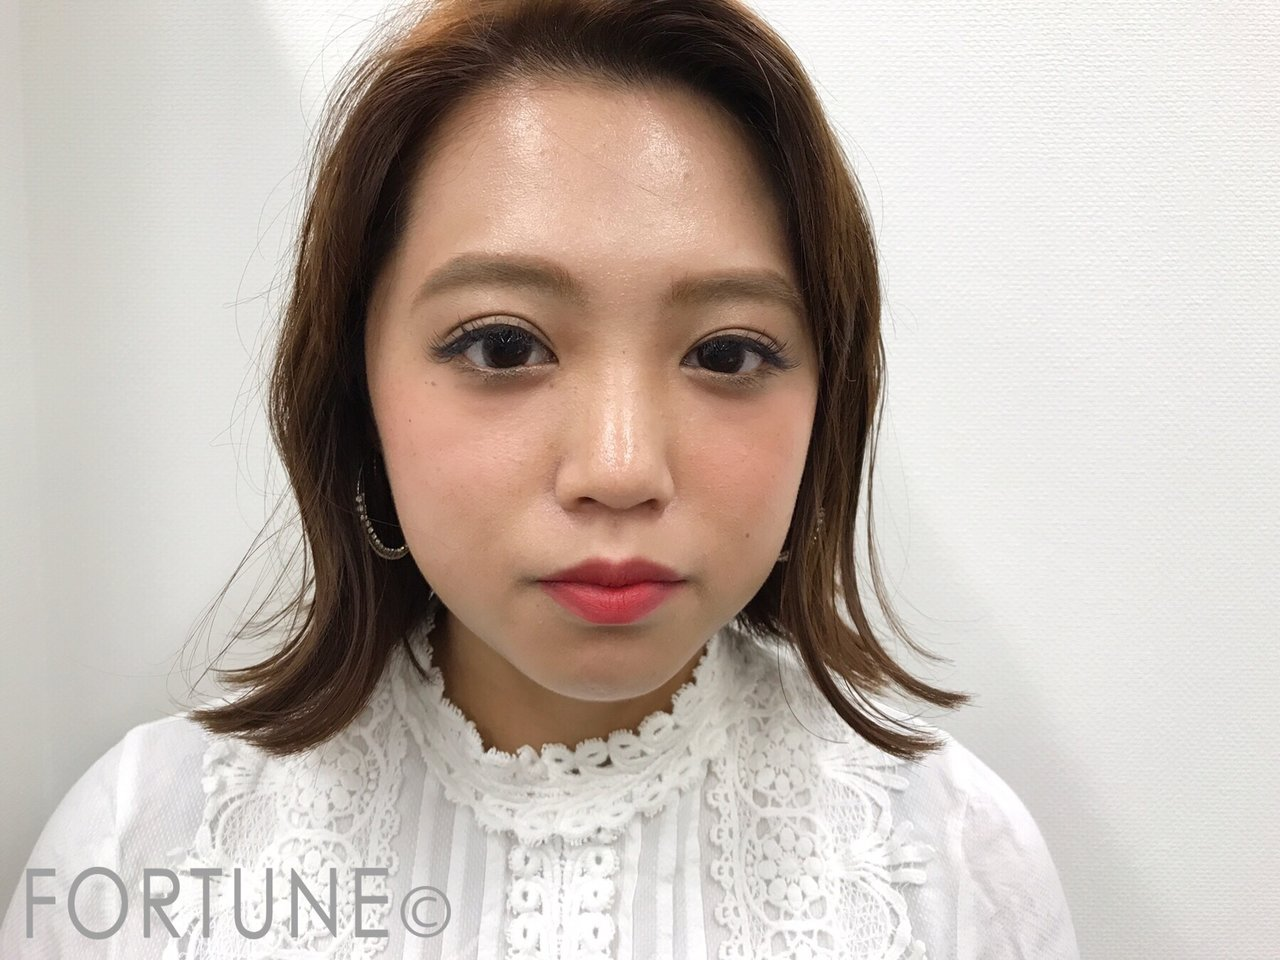 GUERLAIN ゲラン KISSKISS MAT キスキスマット 2017 秋冬 新作コスメ マットリップ